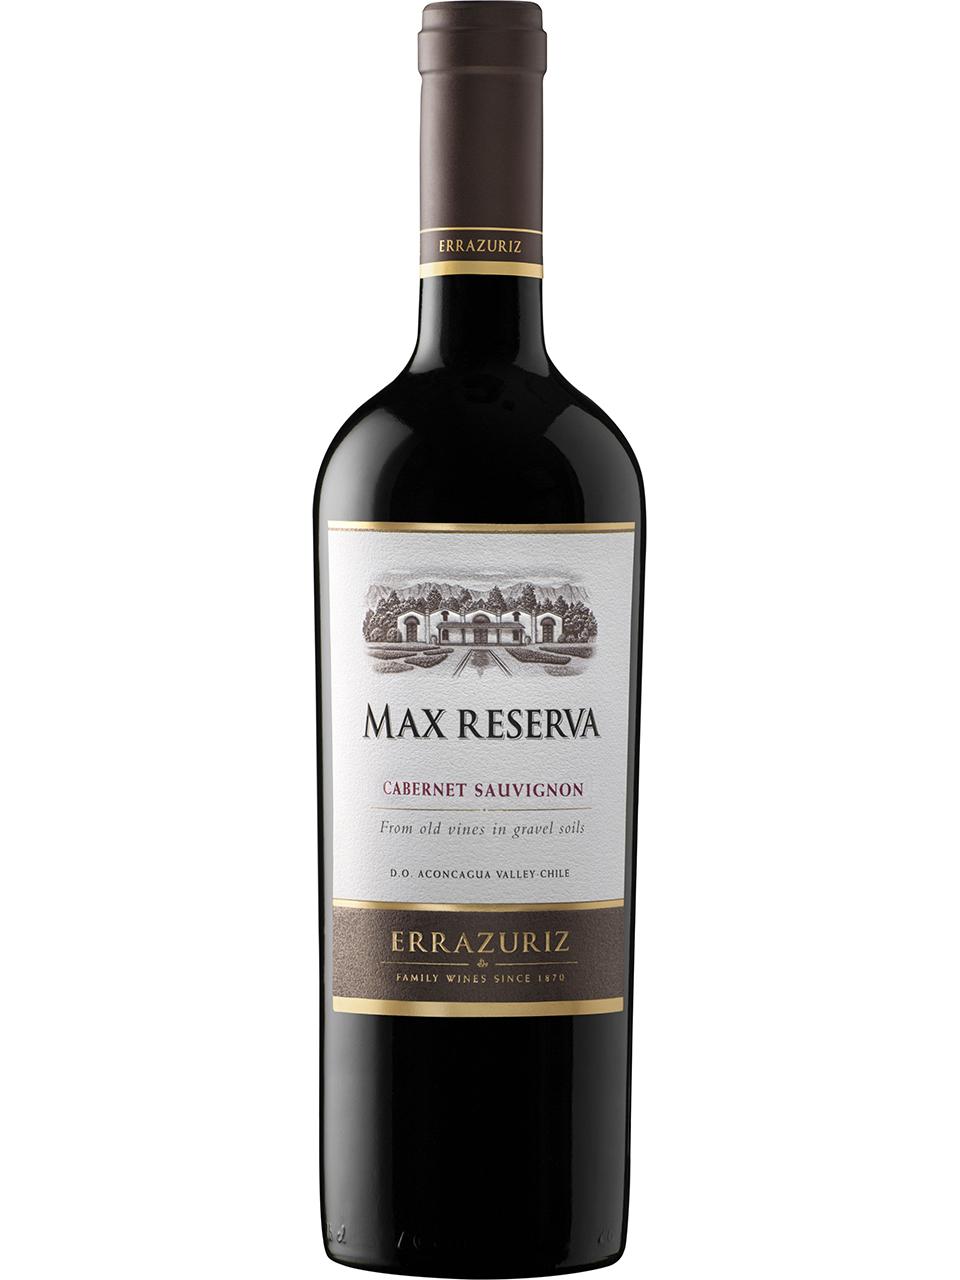 Errazuriz Max Reserva Cabernet Sauvignon